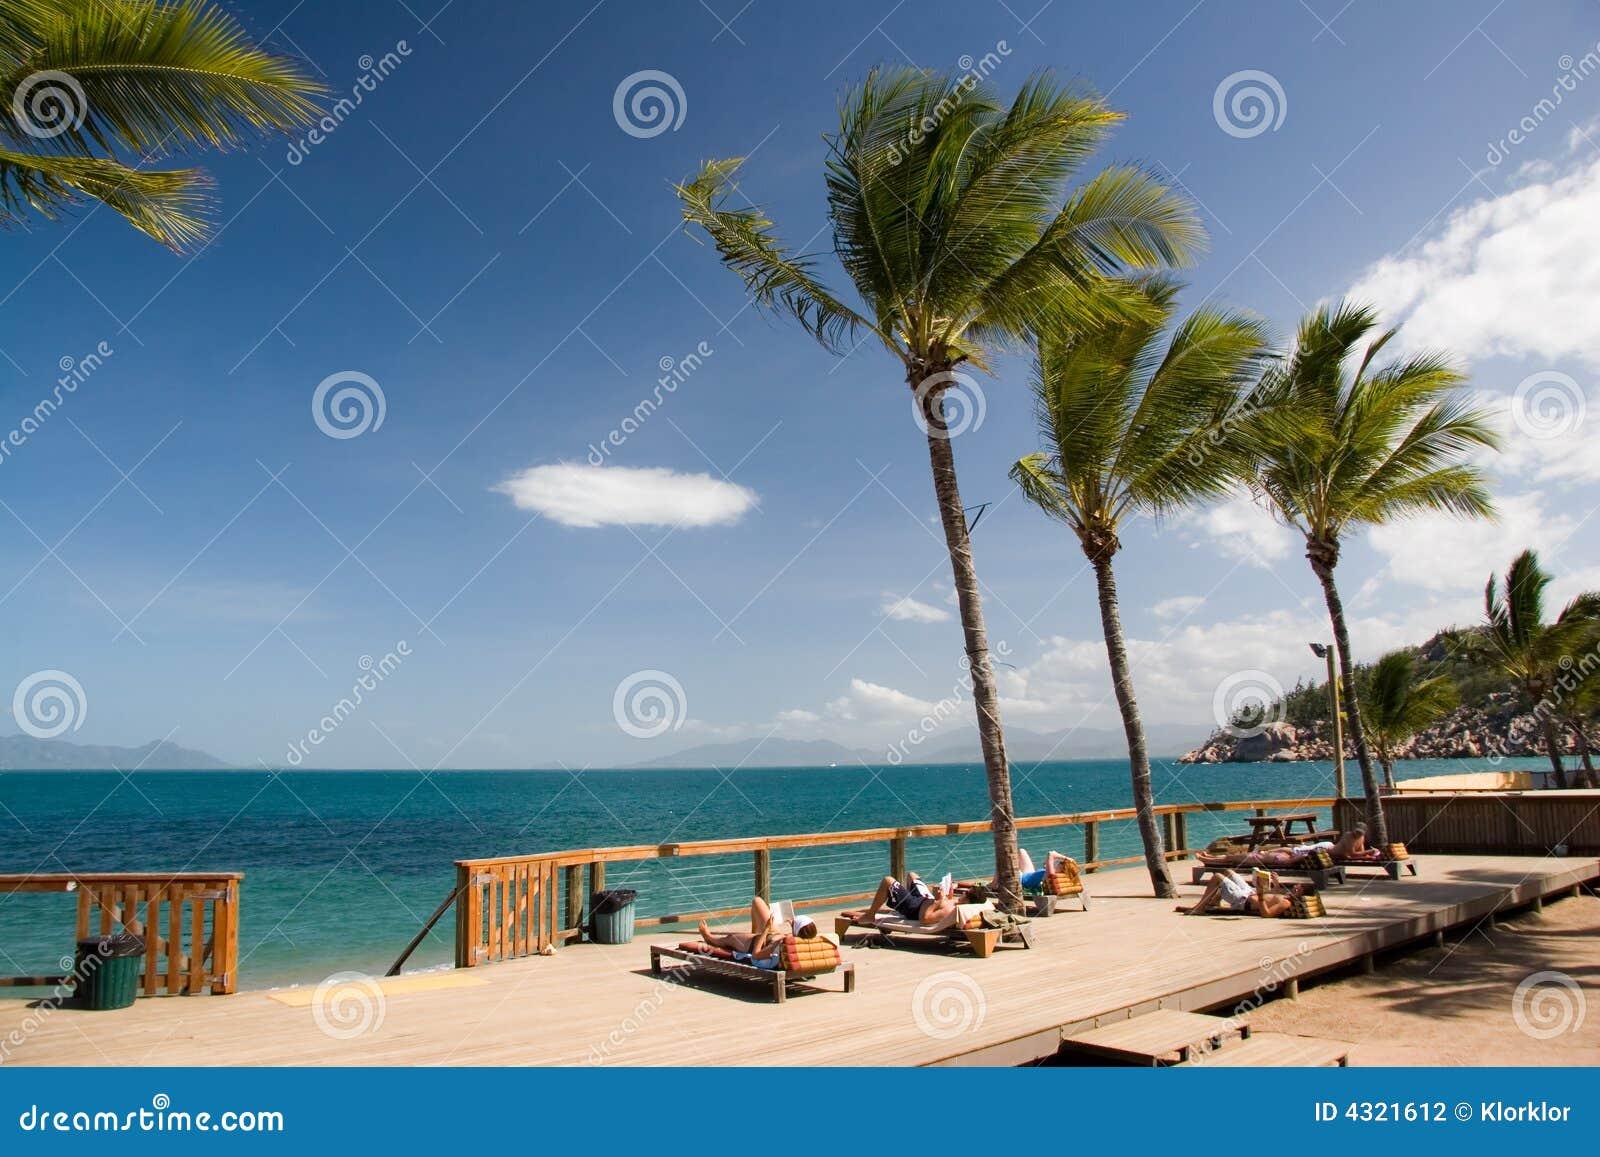 Mensen die op een tropisch eiland ontspannen